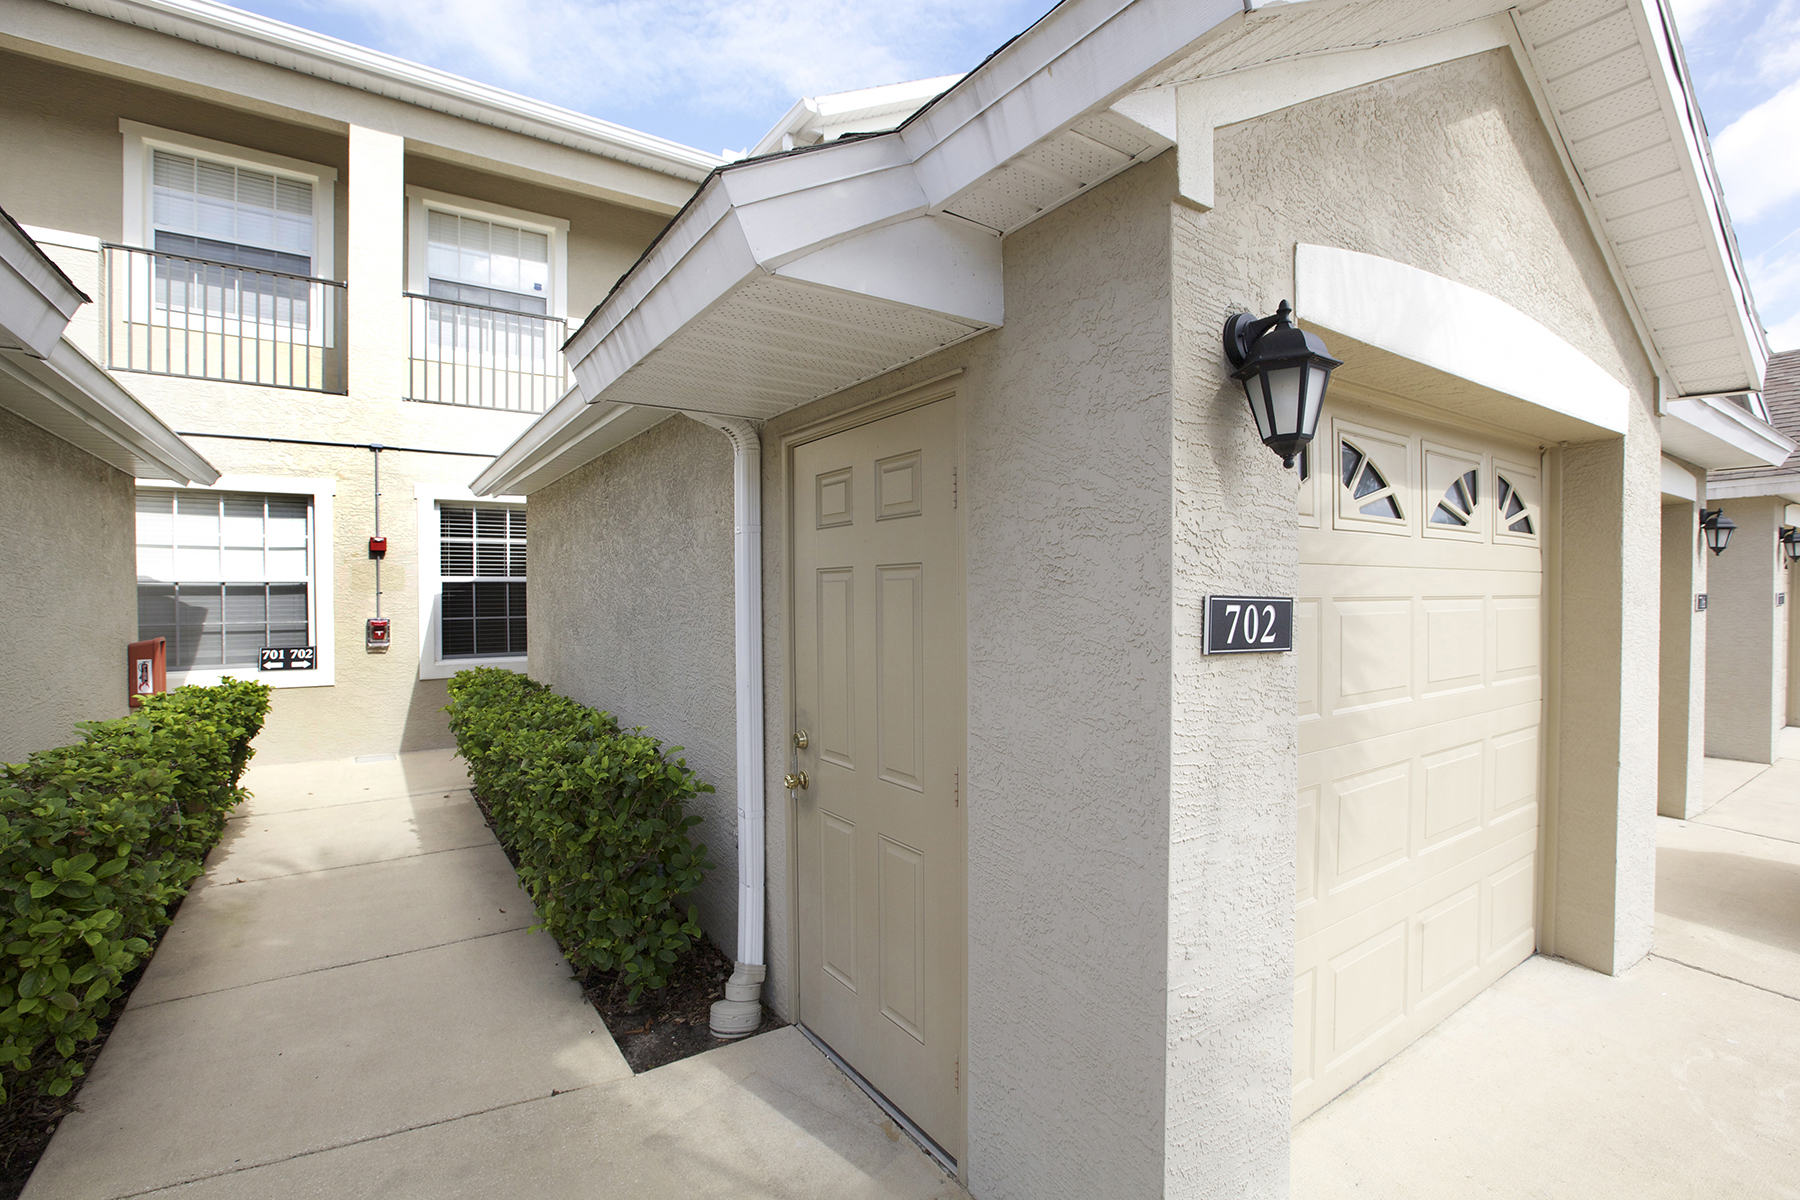 Condomínio para Venda às LAKE NONA 9416 Myrtle Creek Ln 702 Orlando, Florida, 32832 Estados Unidos